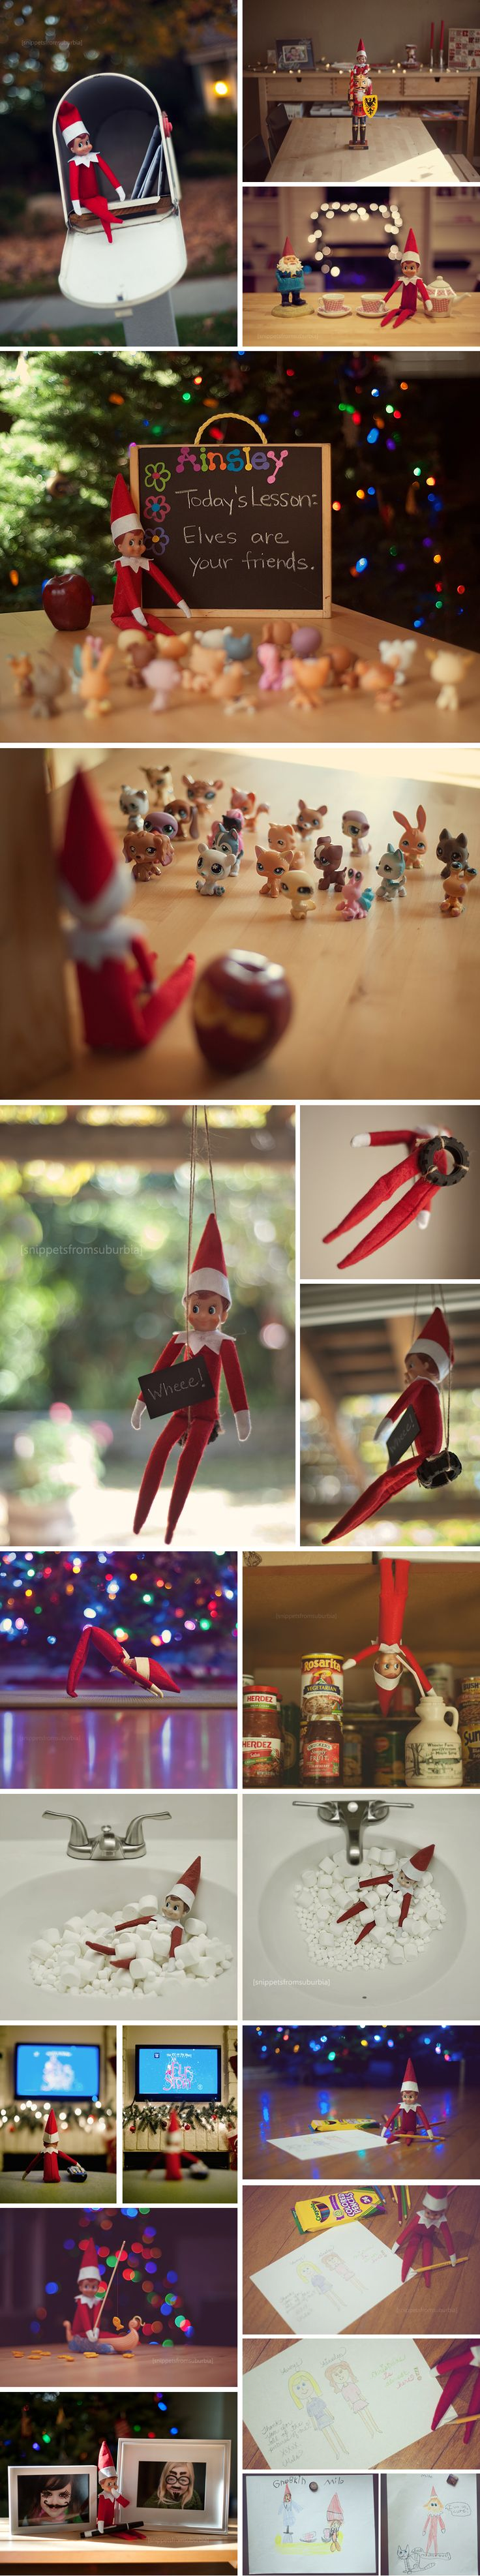 Lots of adorable Elf on a Shelf Ideas!